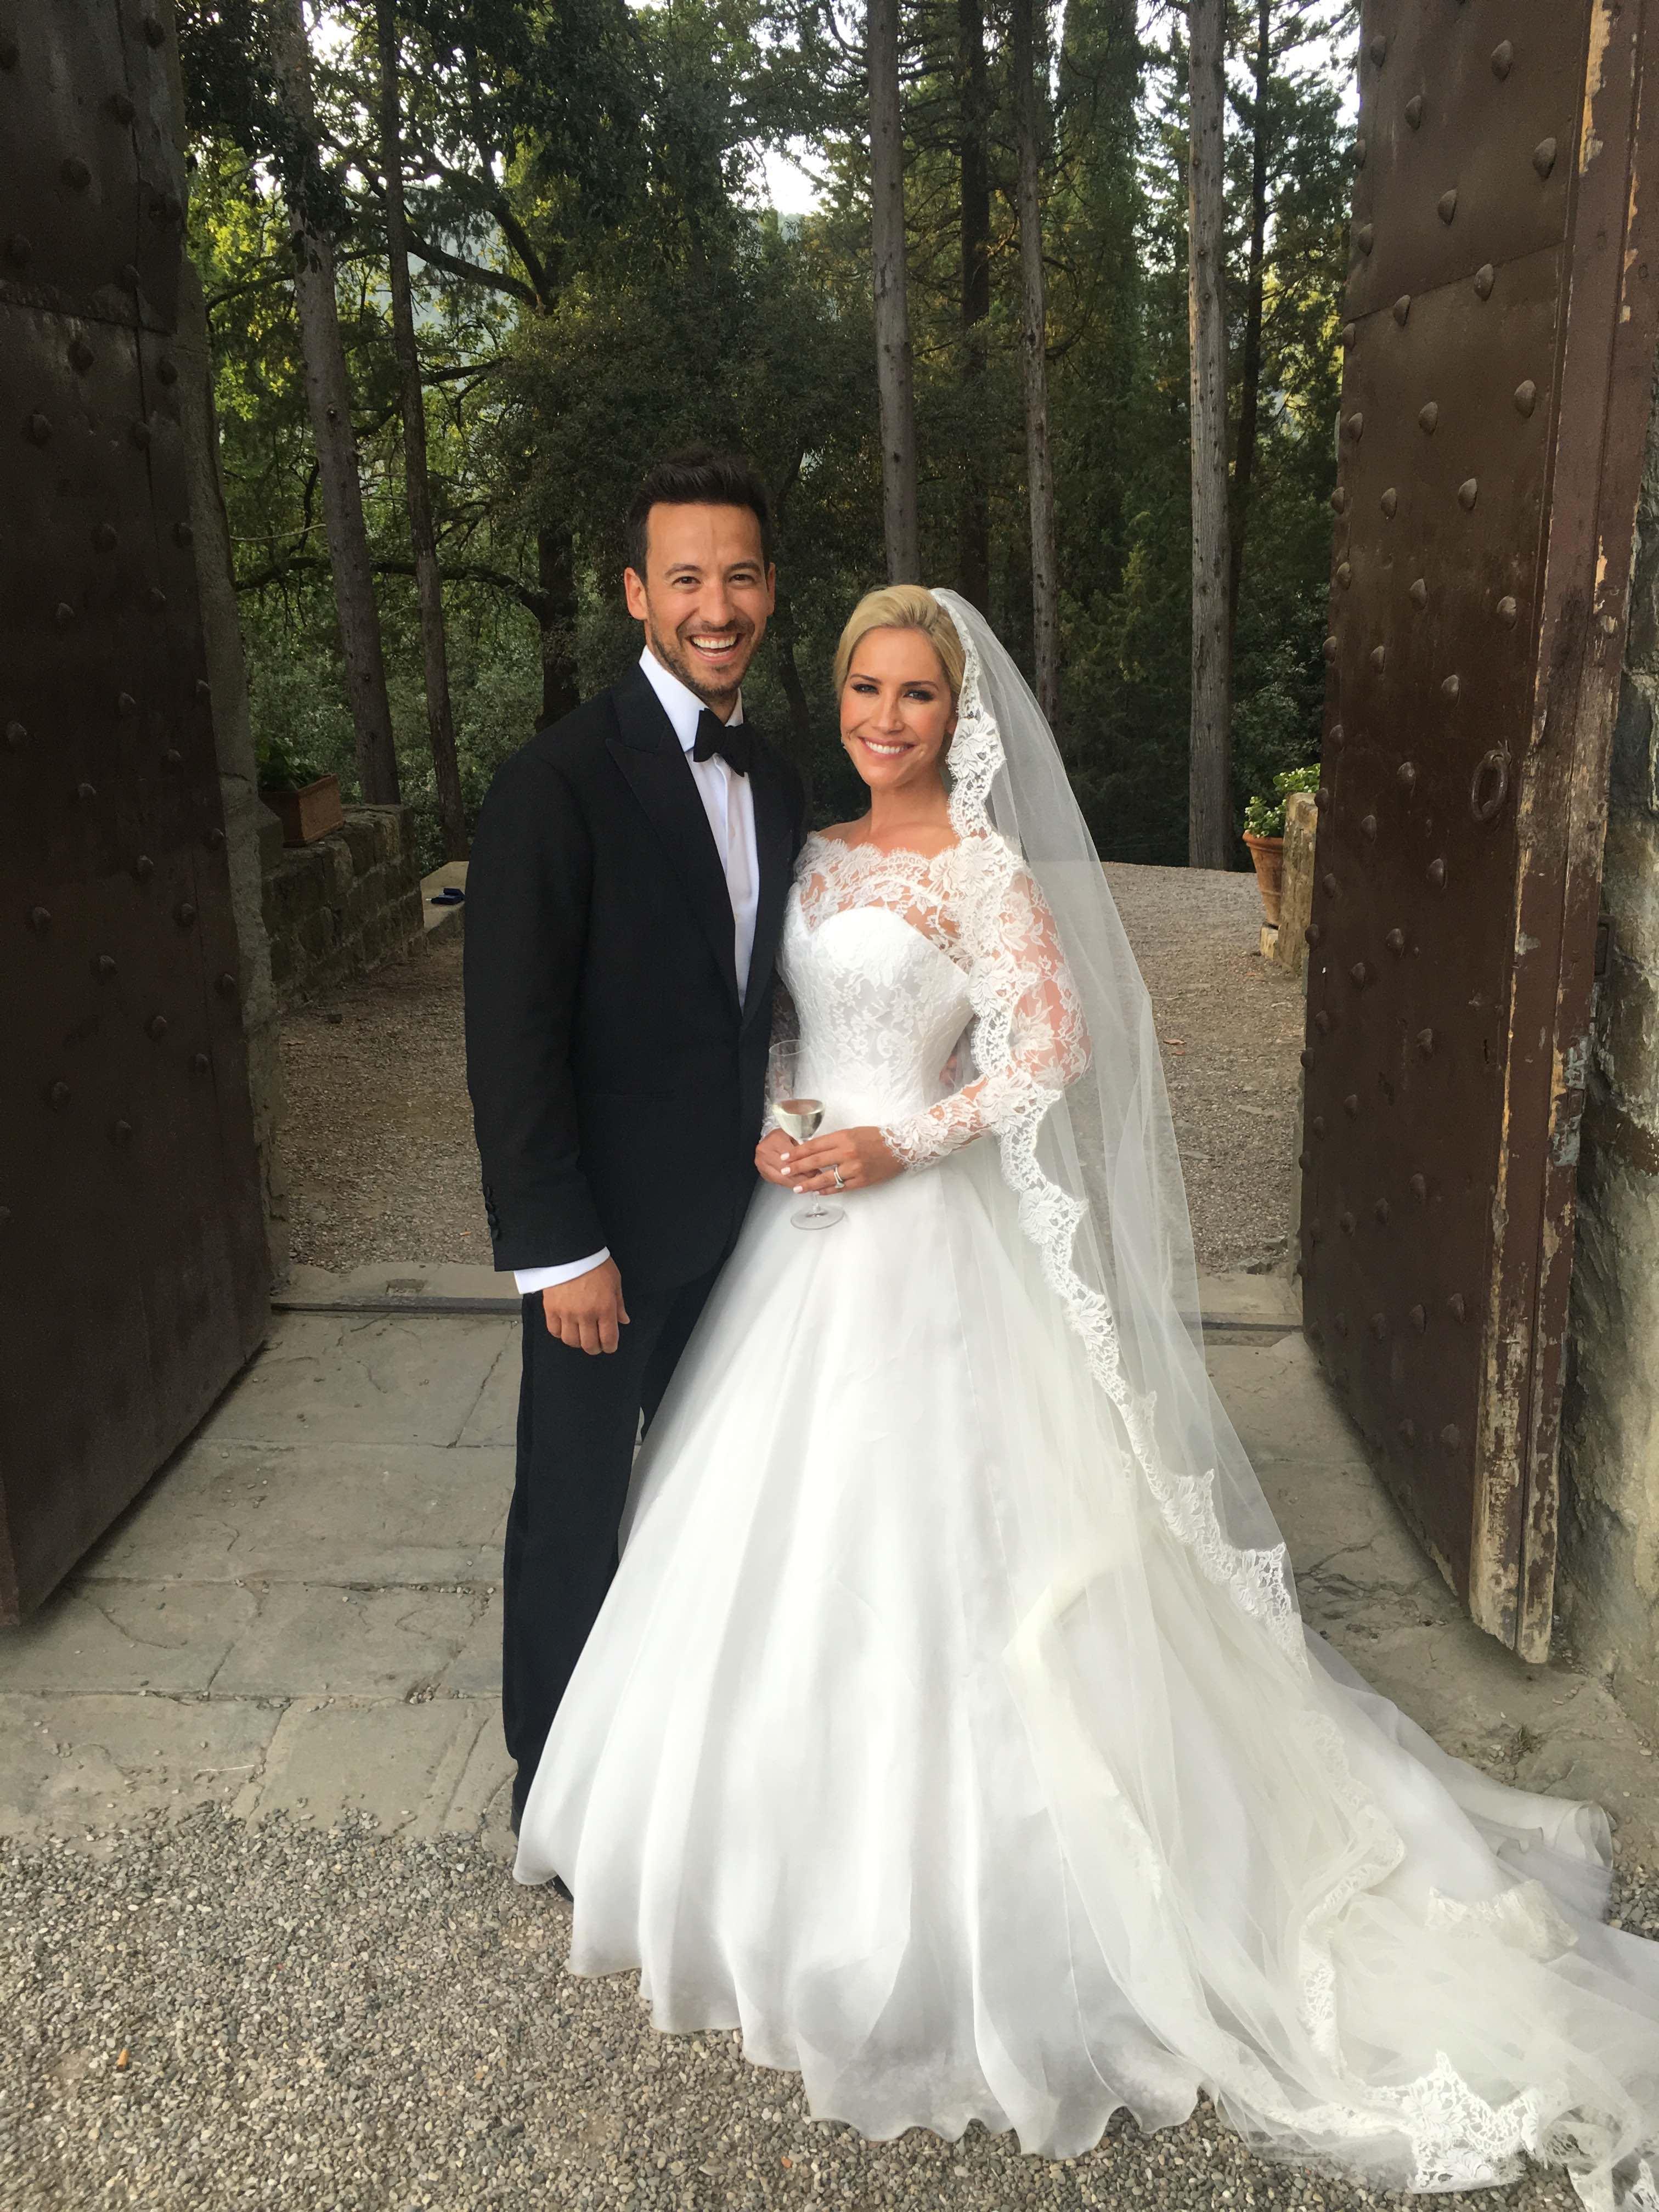 Real Life Brides by Suzanne Neville | Heidi Range Florence wedding